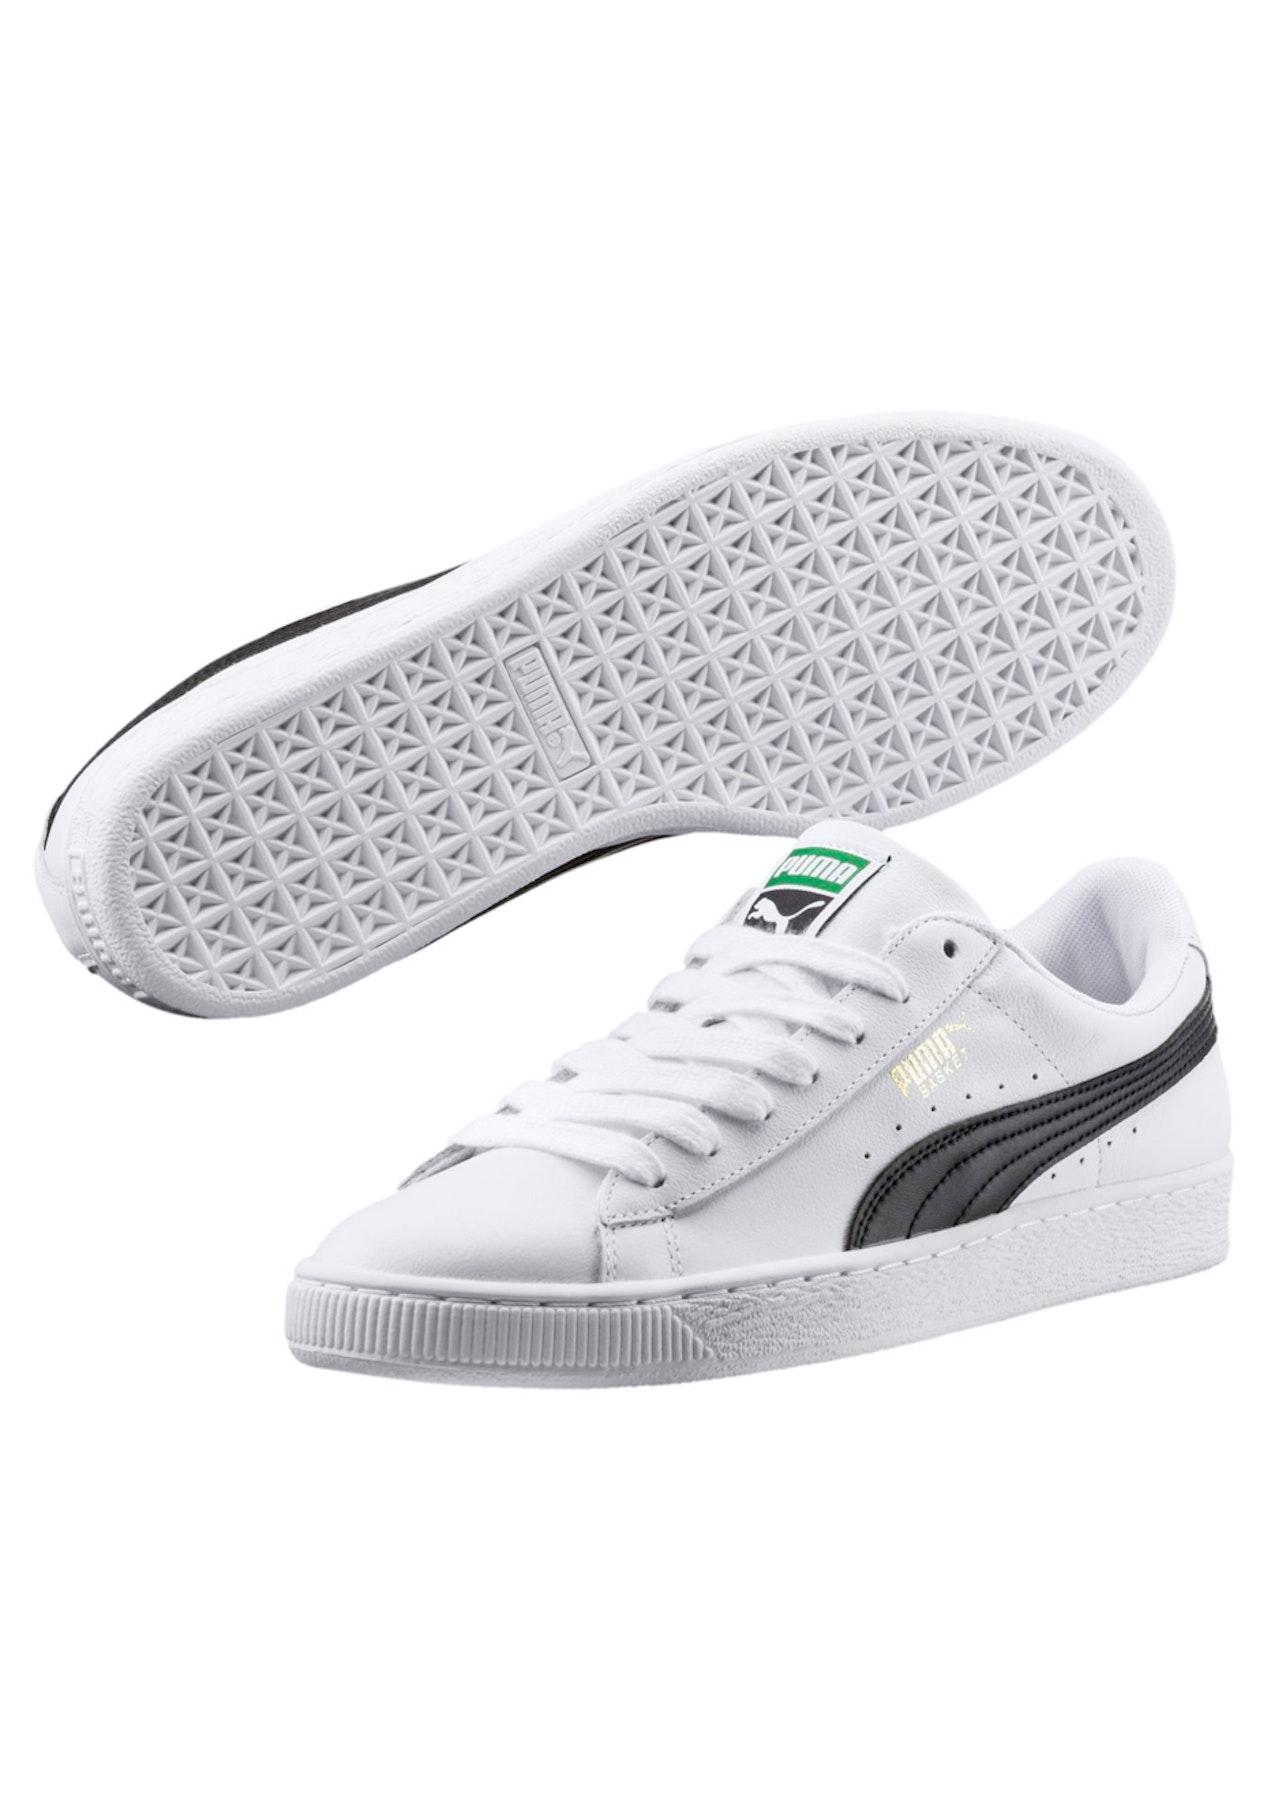 1067b3b3c740 Puma Mens - Basket Classic Lfs - White Black - Free Shipping Activewear  Reductions - Onceit